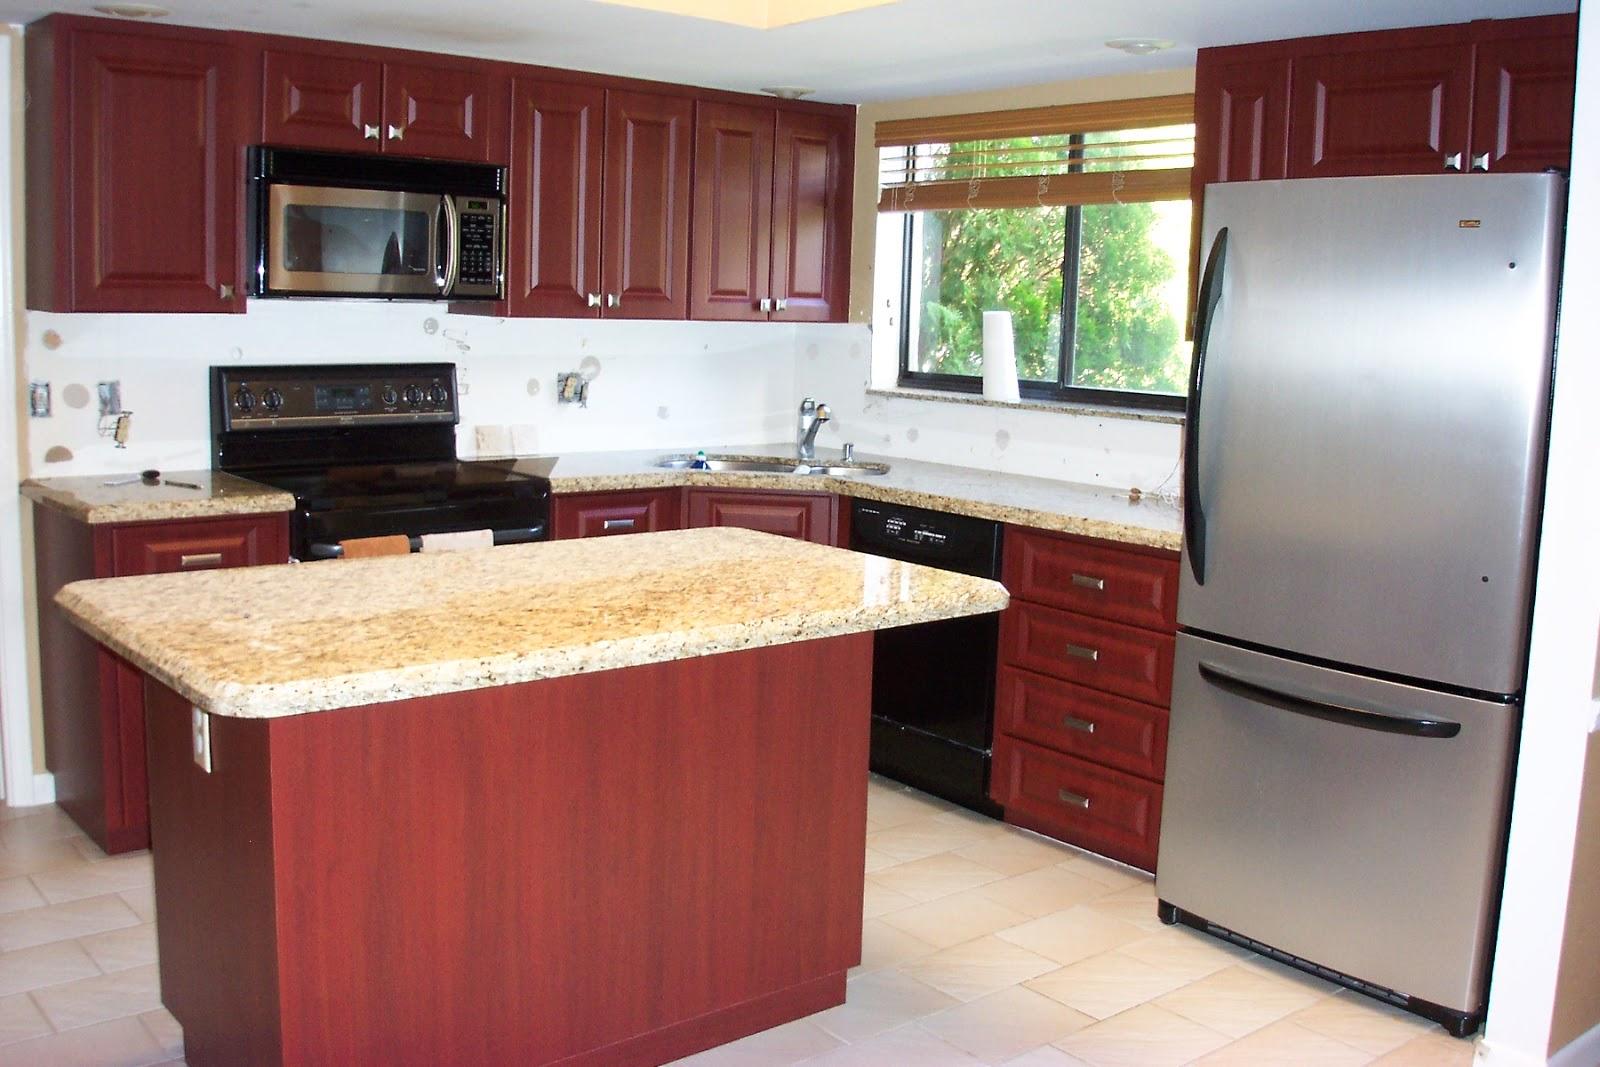 U201cKitchen Refacing U201d Cabinet Refacing U201cRefacing U201cCabinets Refacingu201d Resurface  Resurfacing Reface Refacing Relaminate Laminate Kitchen Remodeling Remodel  ...